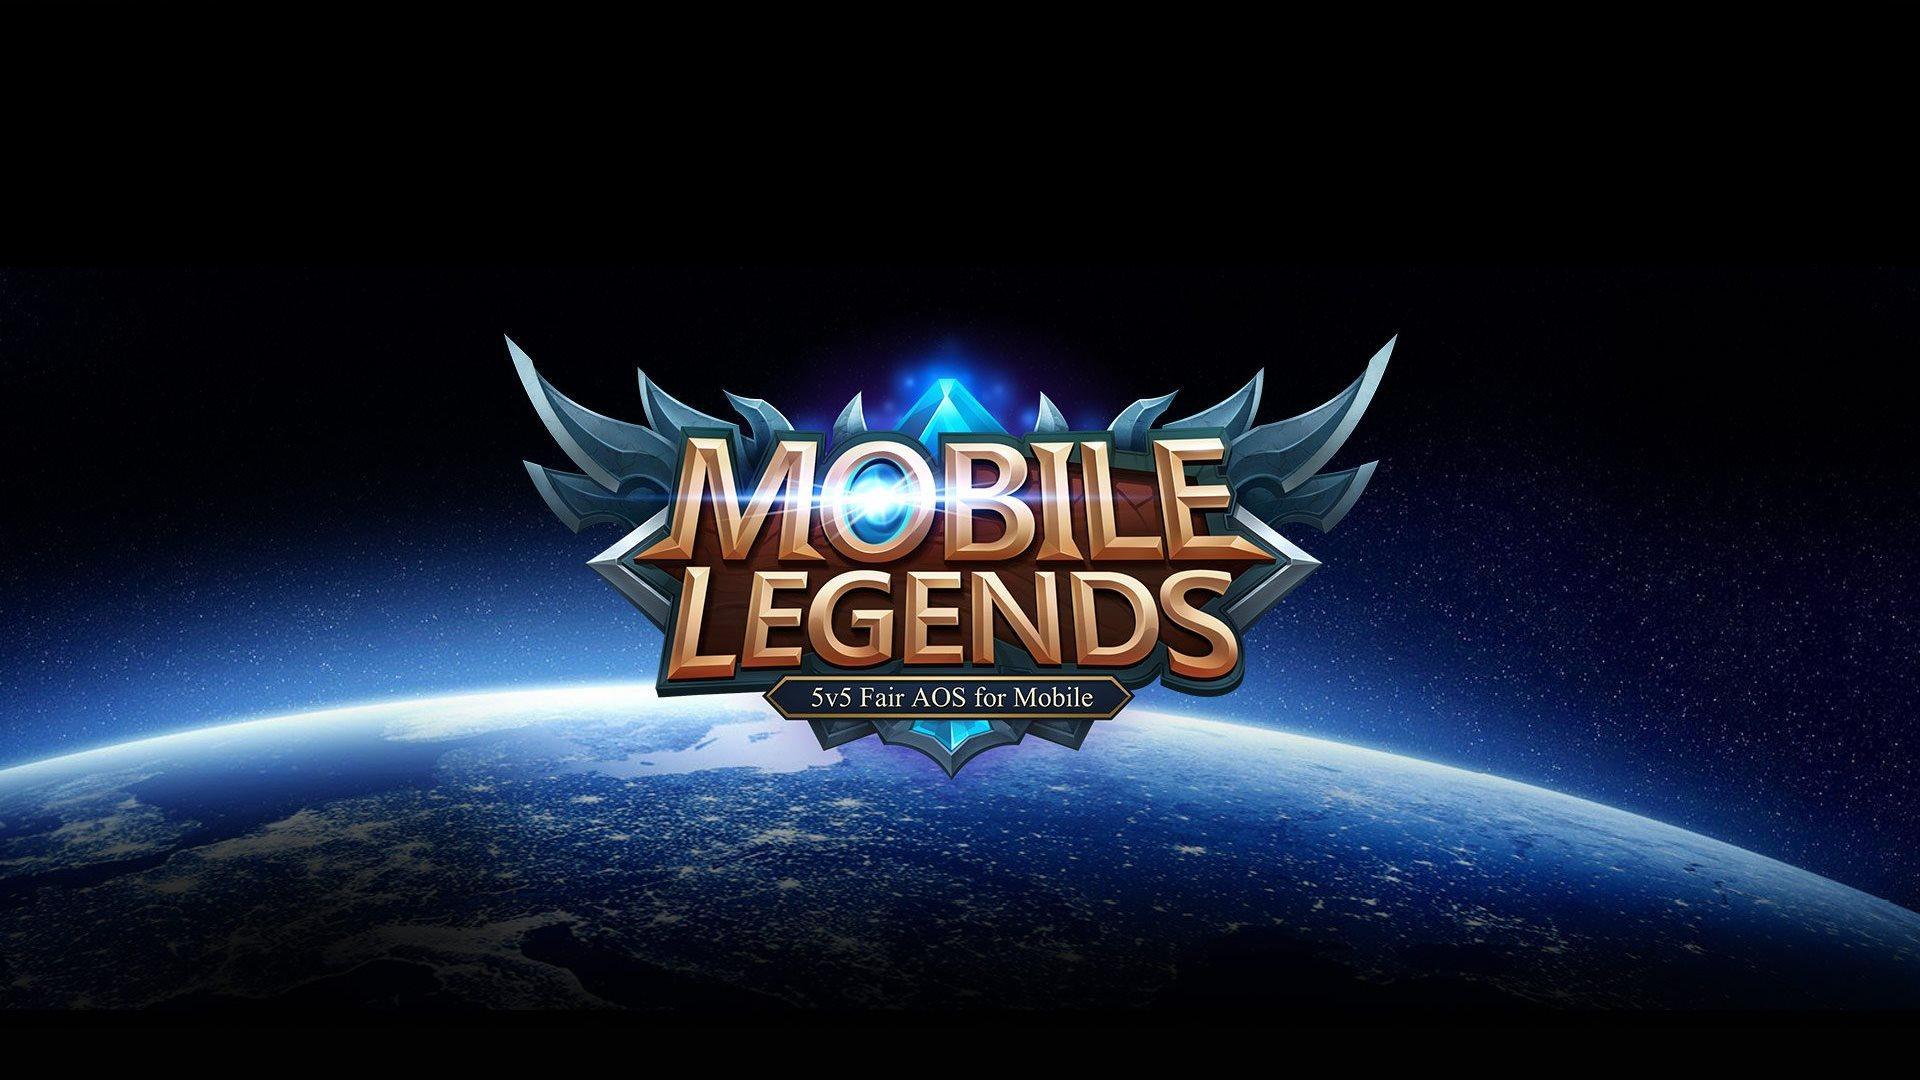 Cara Mendapatkan Teman Mabar Pro Mobile Legends Ml Esportsku